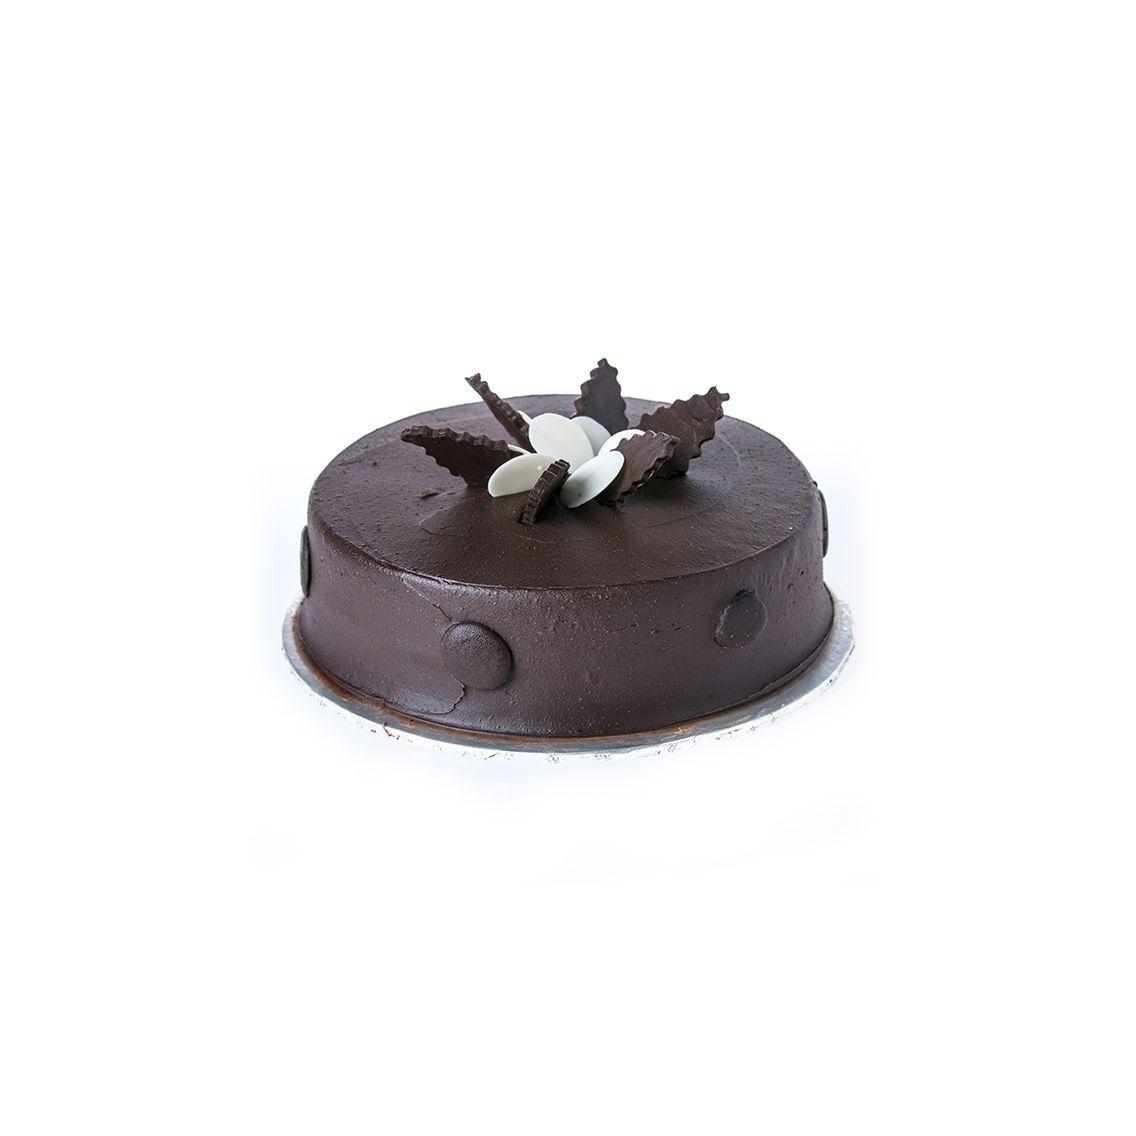 Kitchen Cuisine Default Category Chocolate Fudge Delight Cake